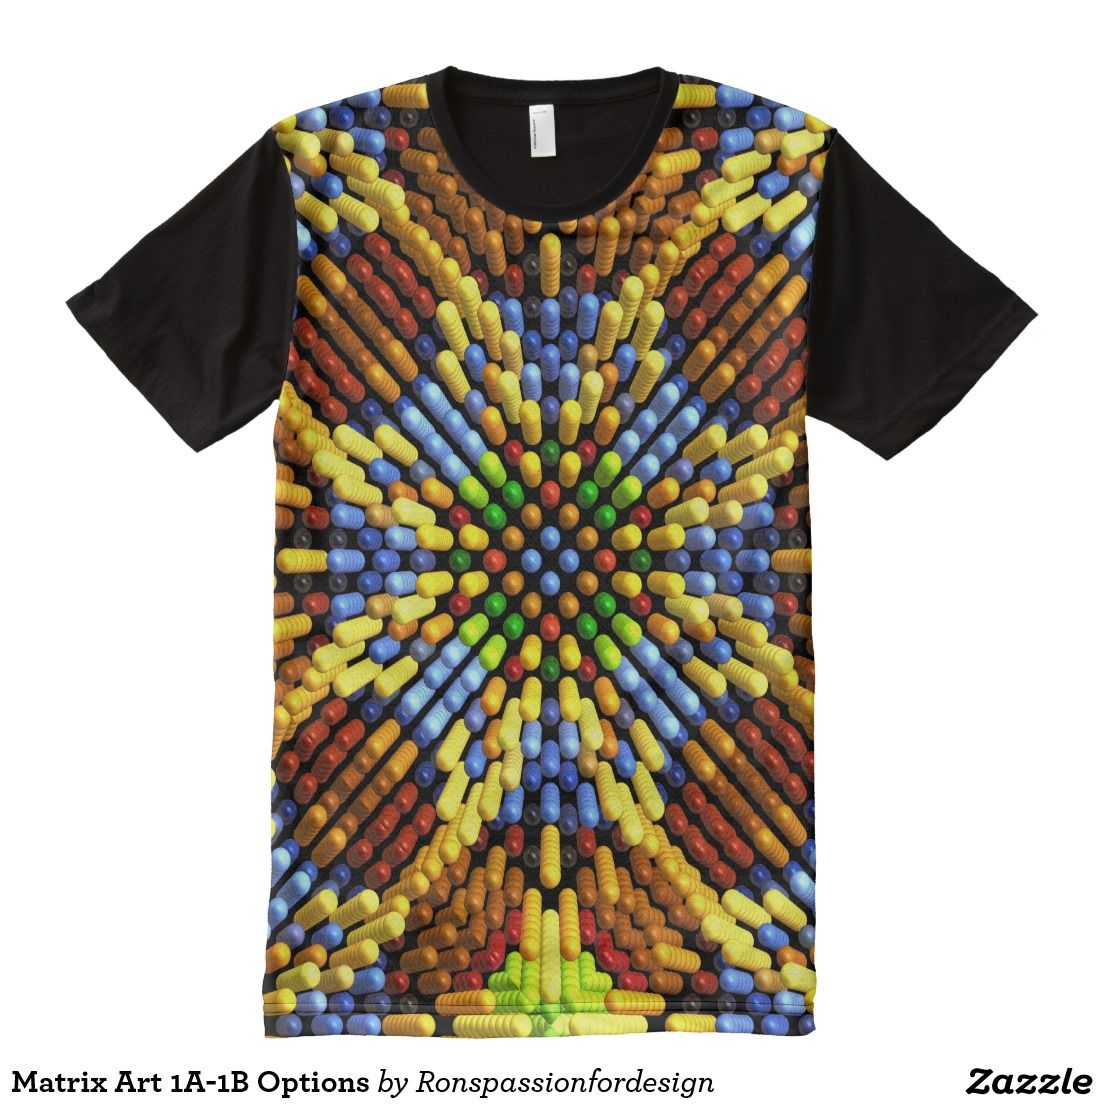 Matrix Art 1a 1b Options All Over Print Shirt